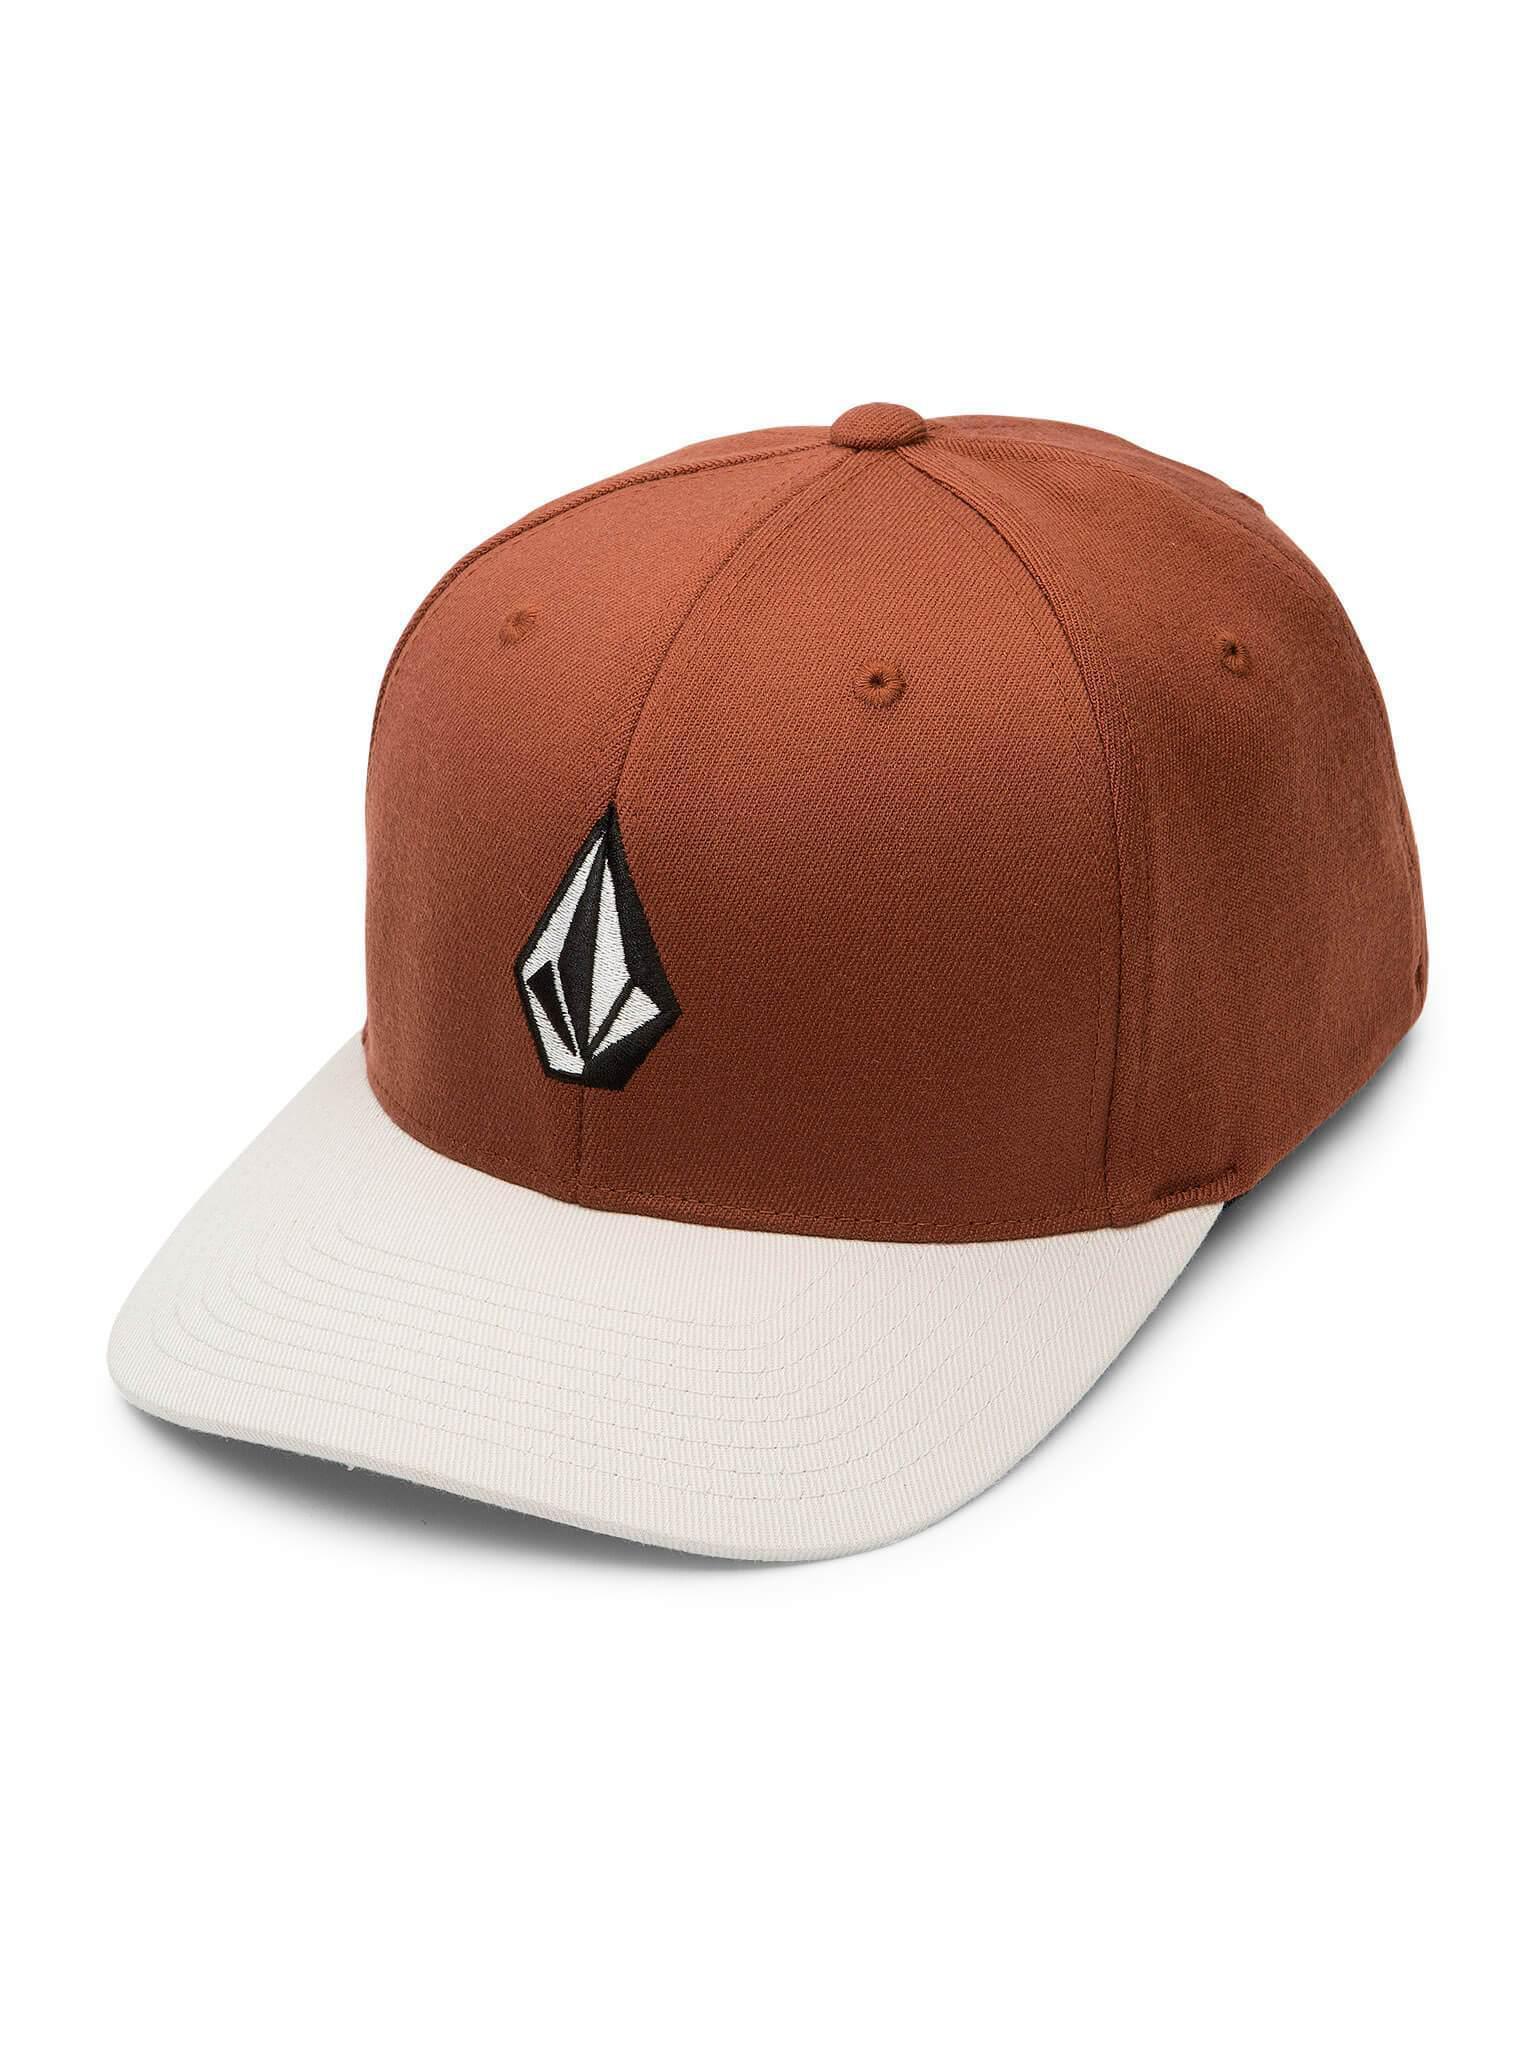 Lyst - Volcom Big Boys Full Stone Xfit Hat for Men 73a0cbb68329